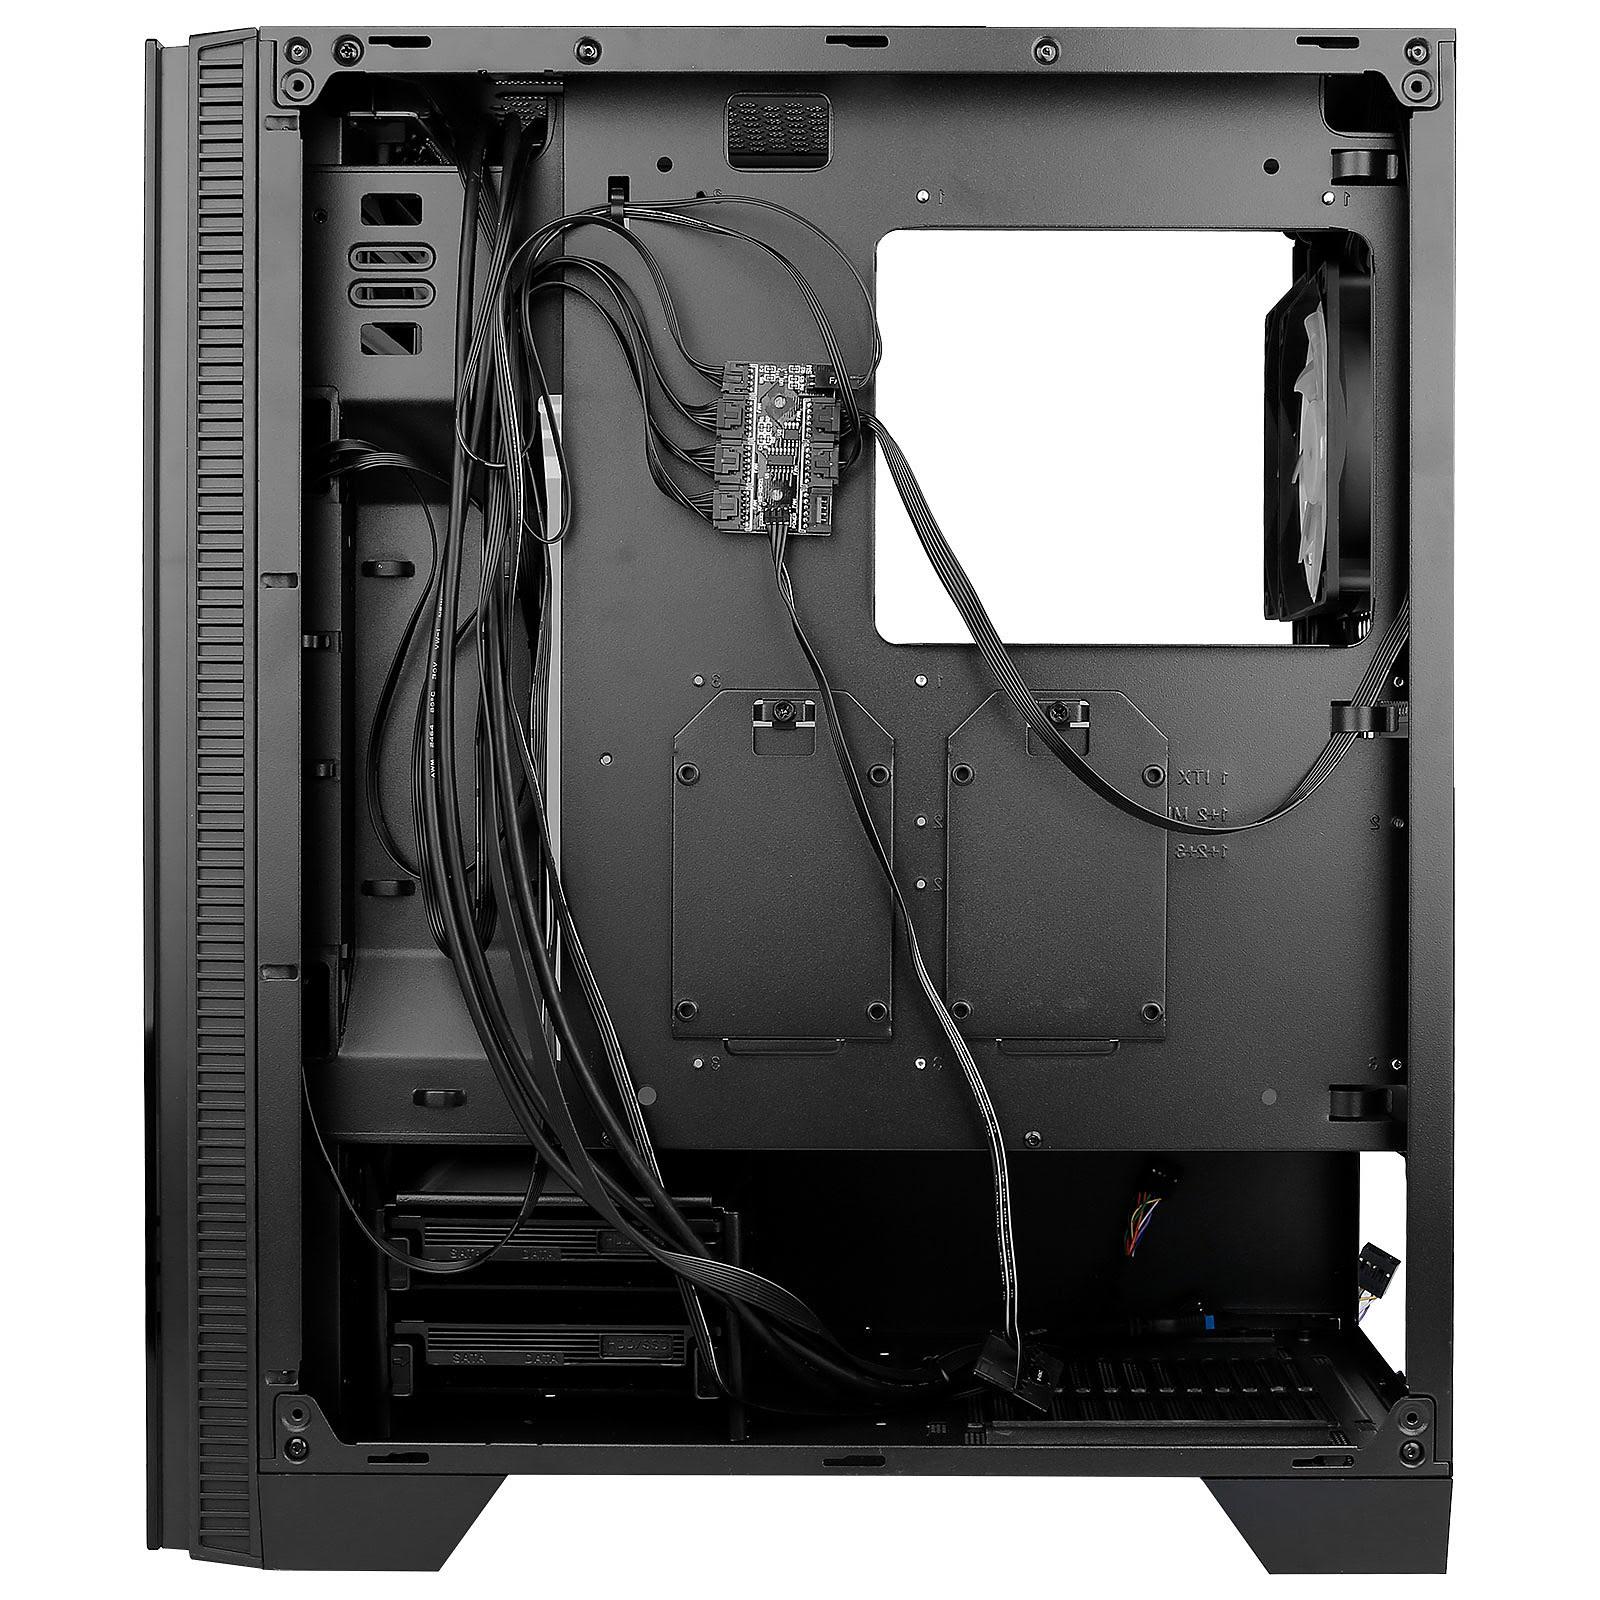 Antec NX600 Noir - Boîtier PC Antec - Cybertek.fr - 2